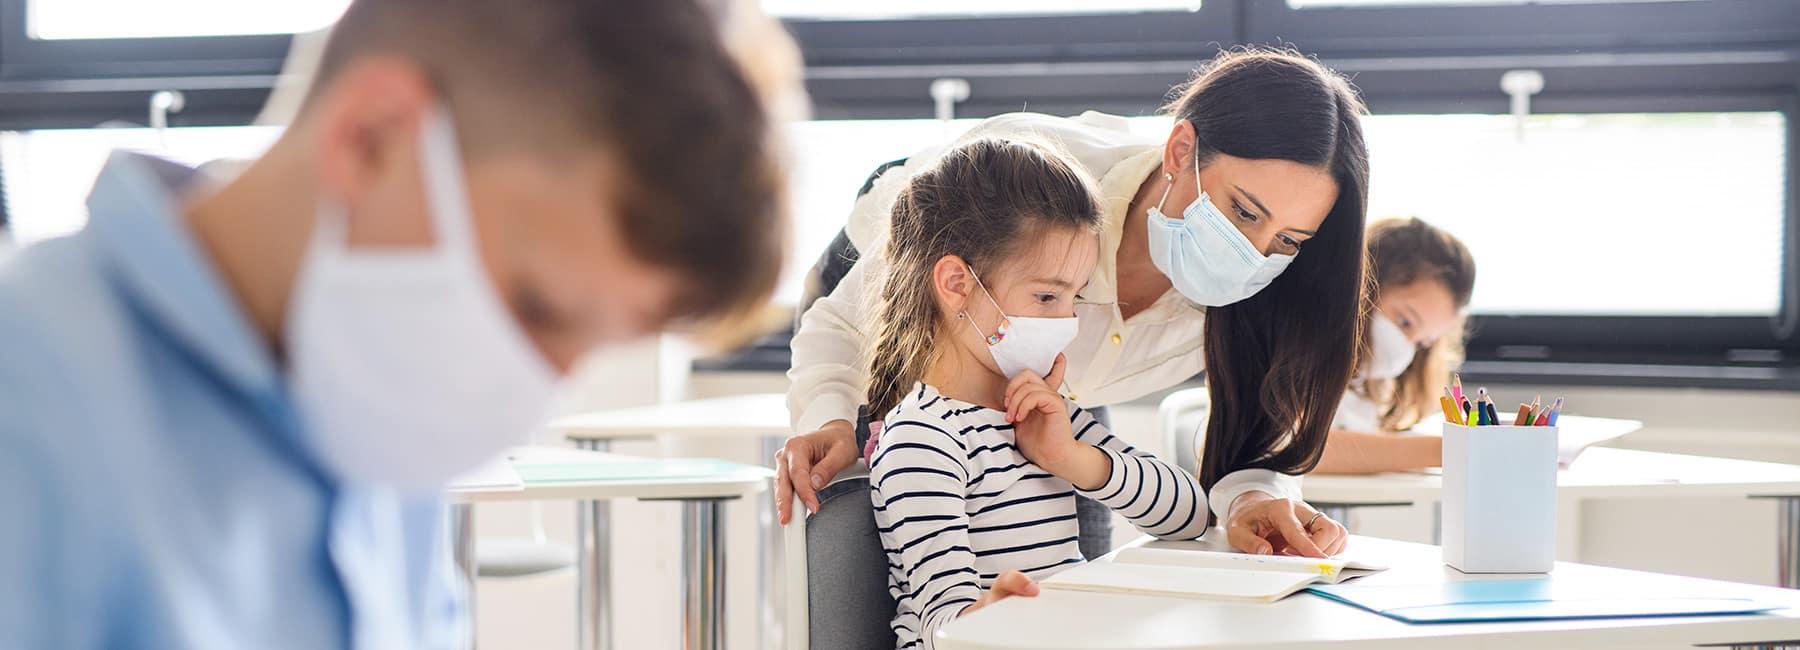 teacher with face mask